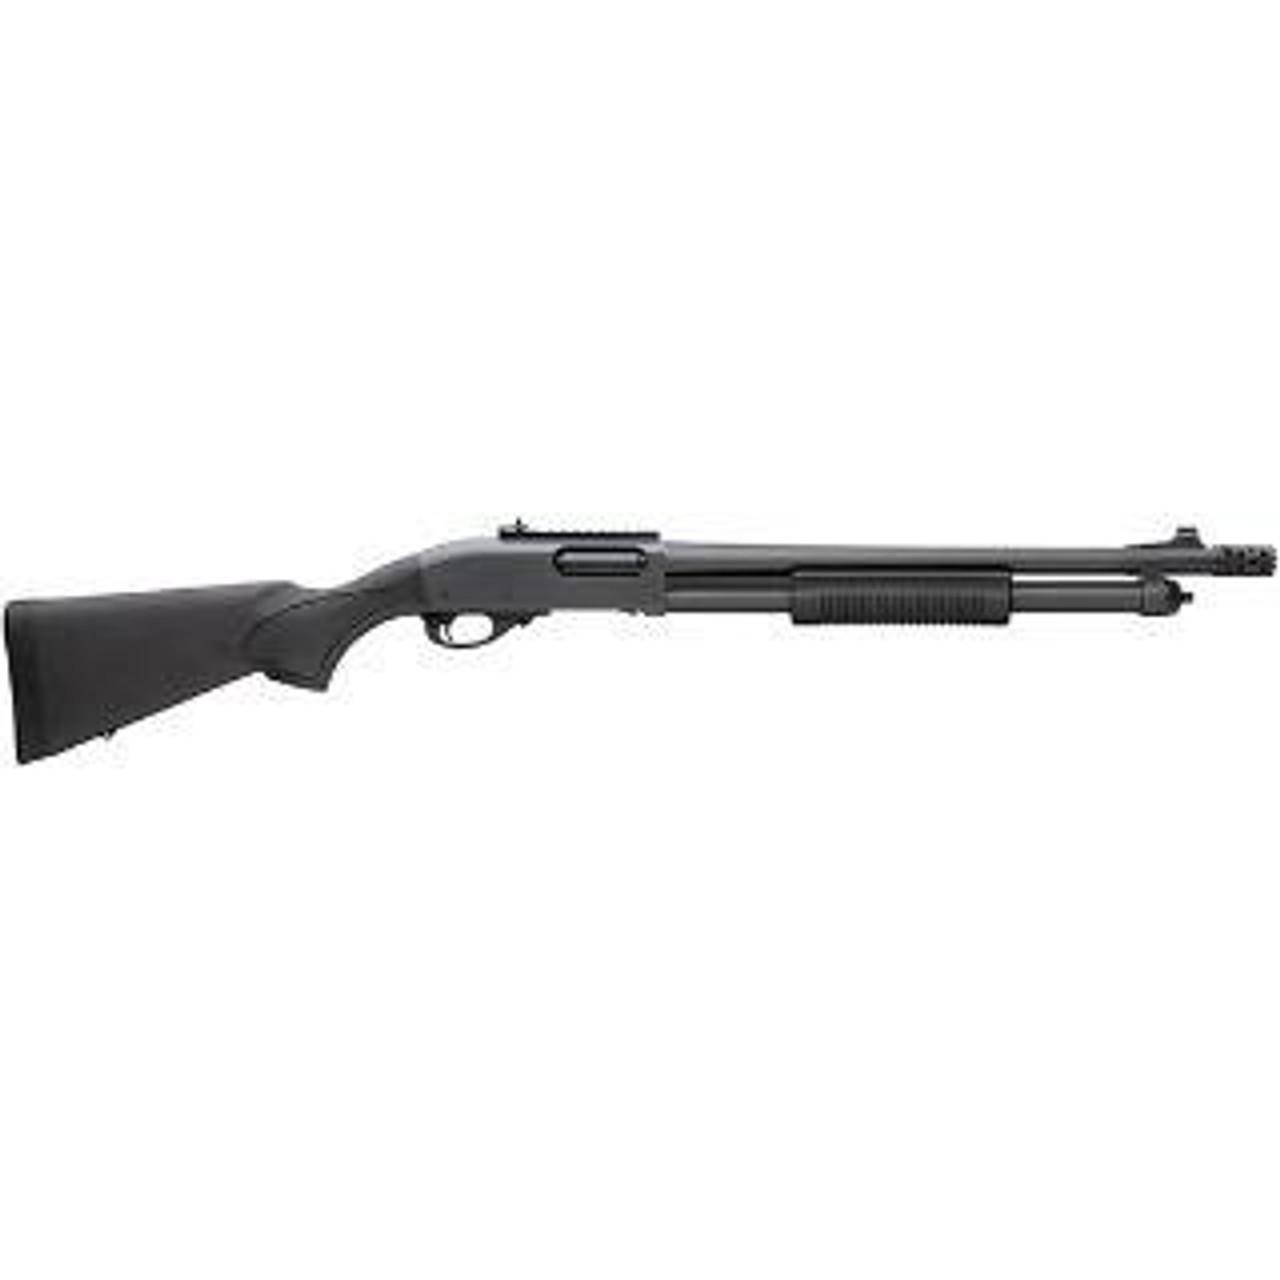 Remington 870 Express Tactical California Legal-12ga